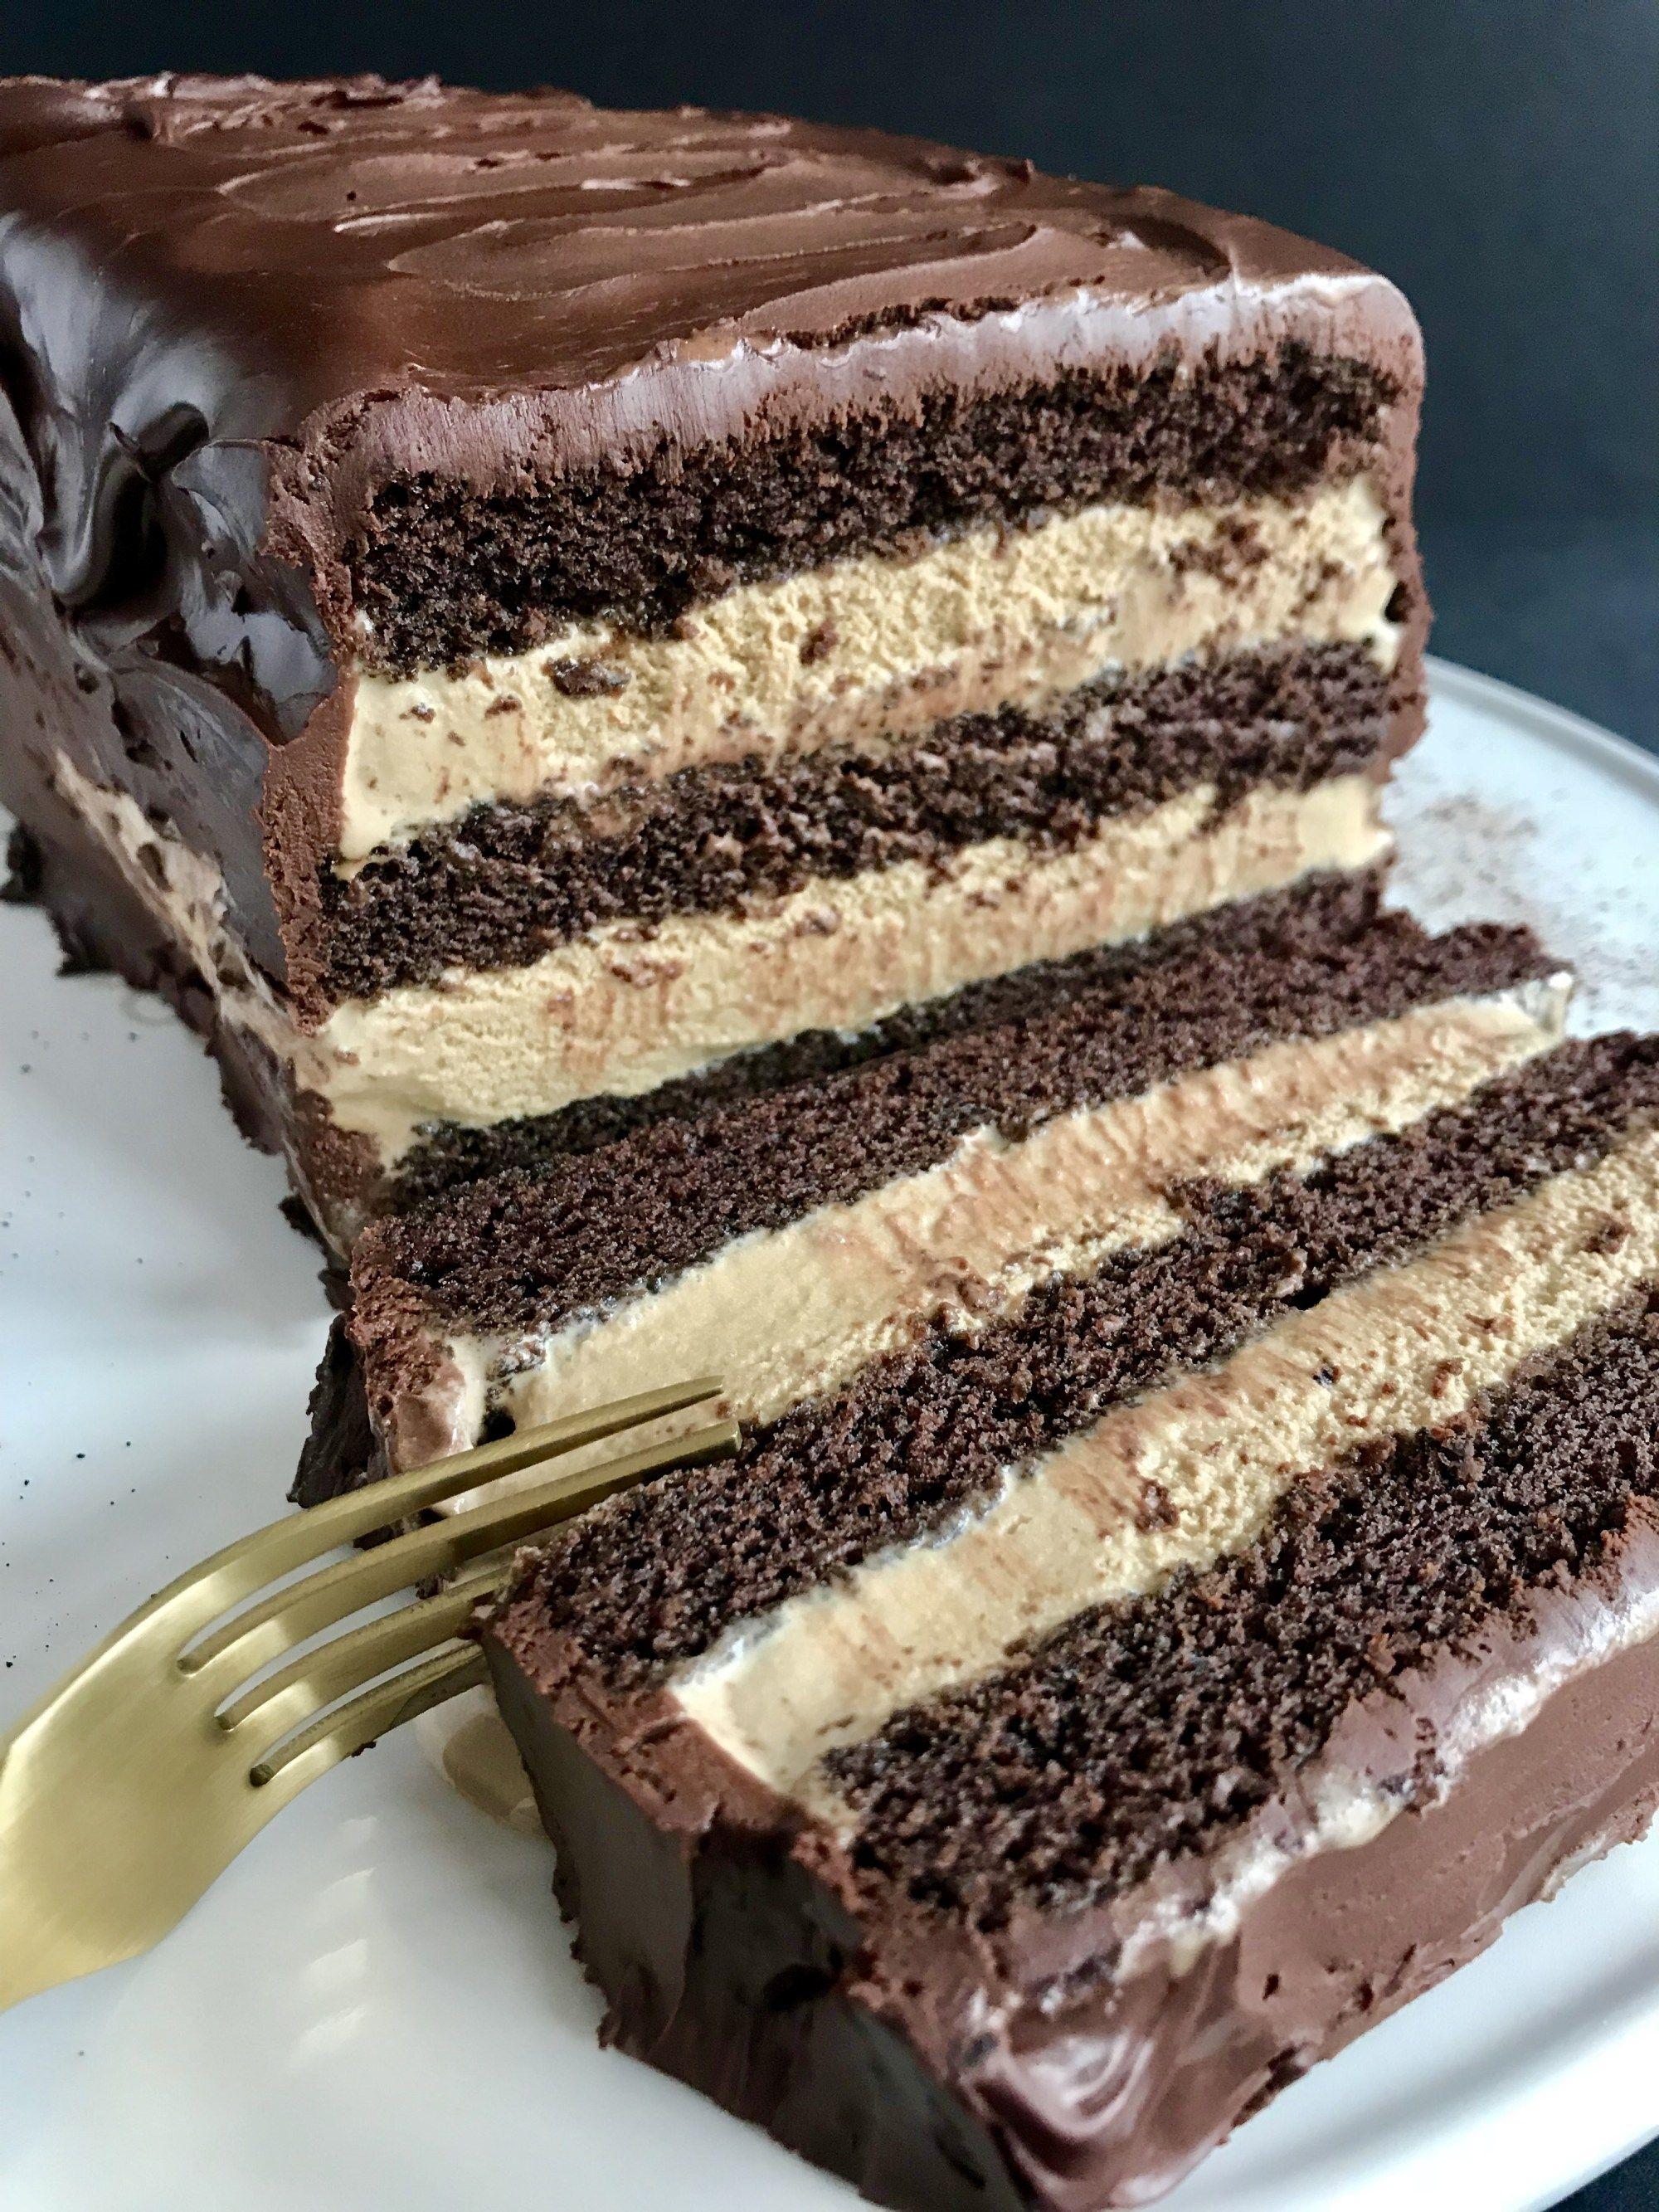 mocha ice cream cake ice cream cake homemade ice cream cake ice cream cake recipe on hebbar s kitchen recipes videos ice cream id=62932